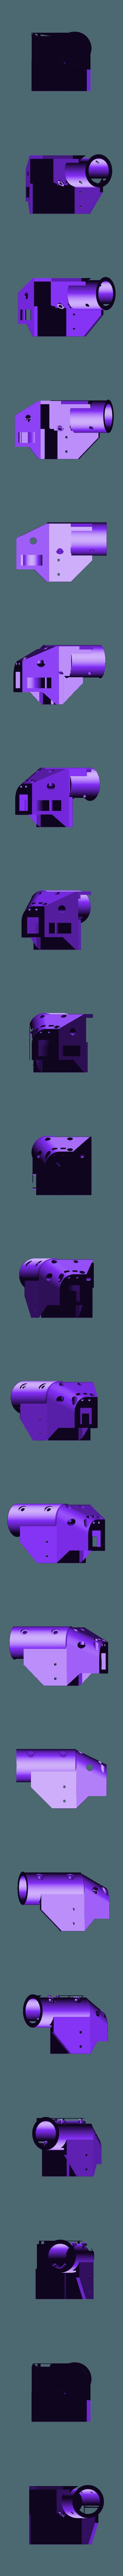 corner_front_left.stl Download free STL file FDM Printer de Kleine Reus 300x300x900 • 3D printable object, Job